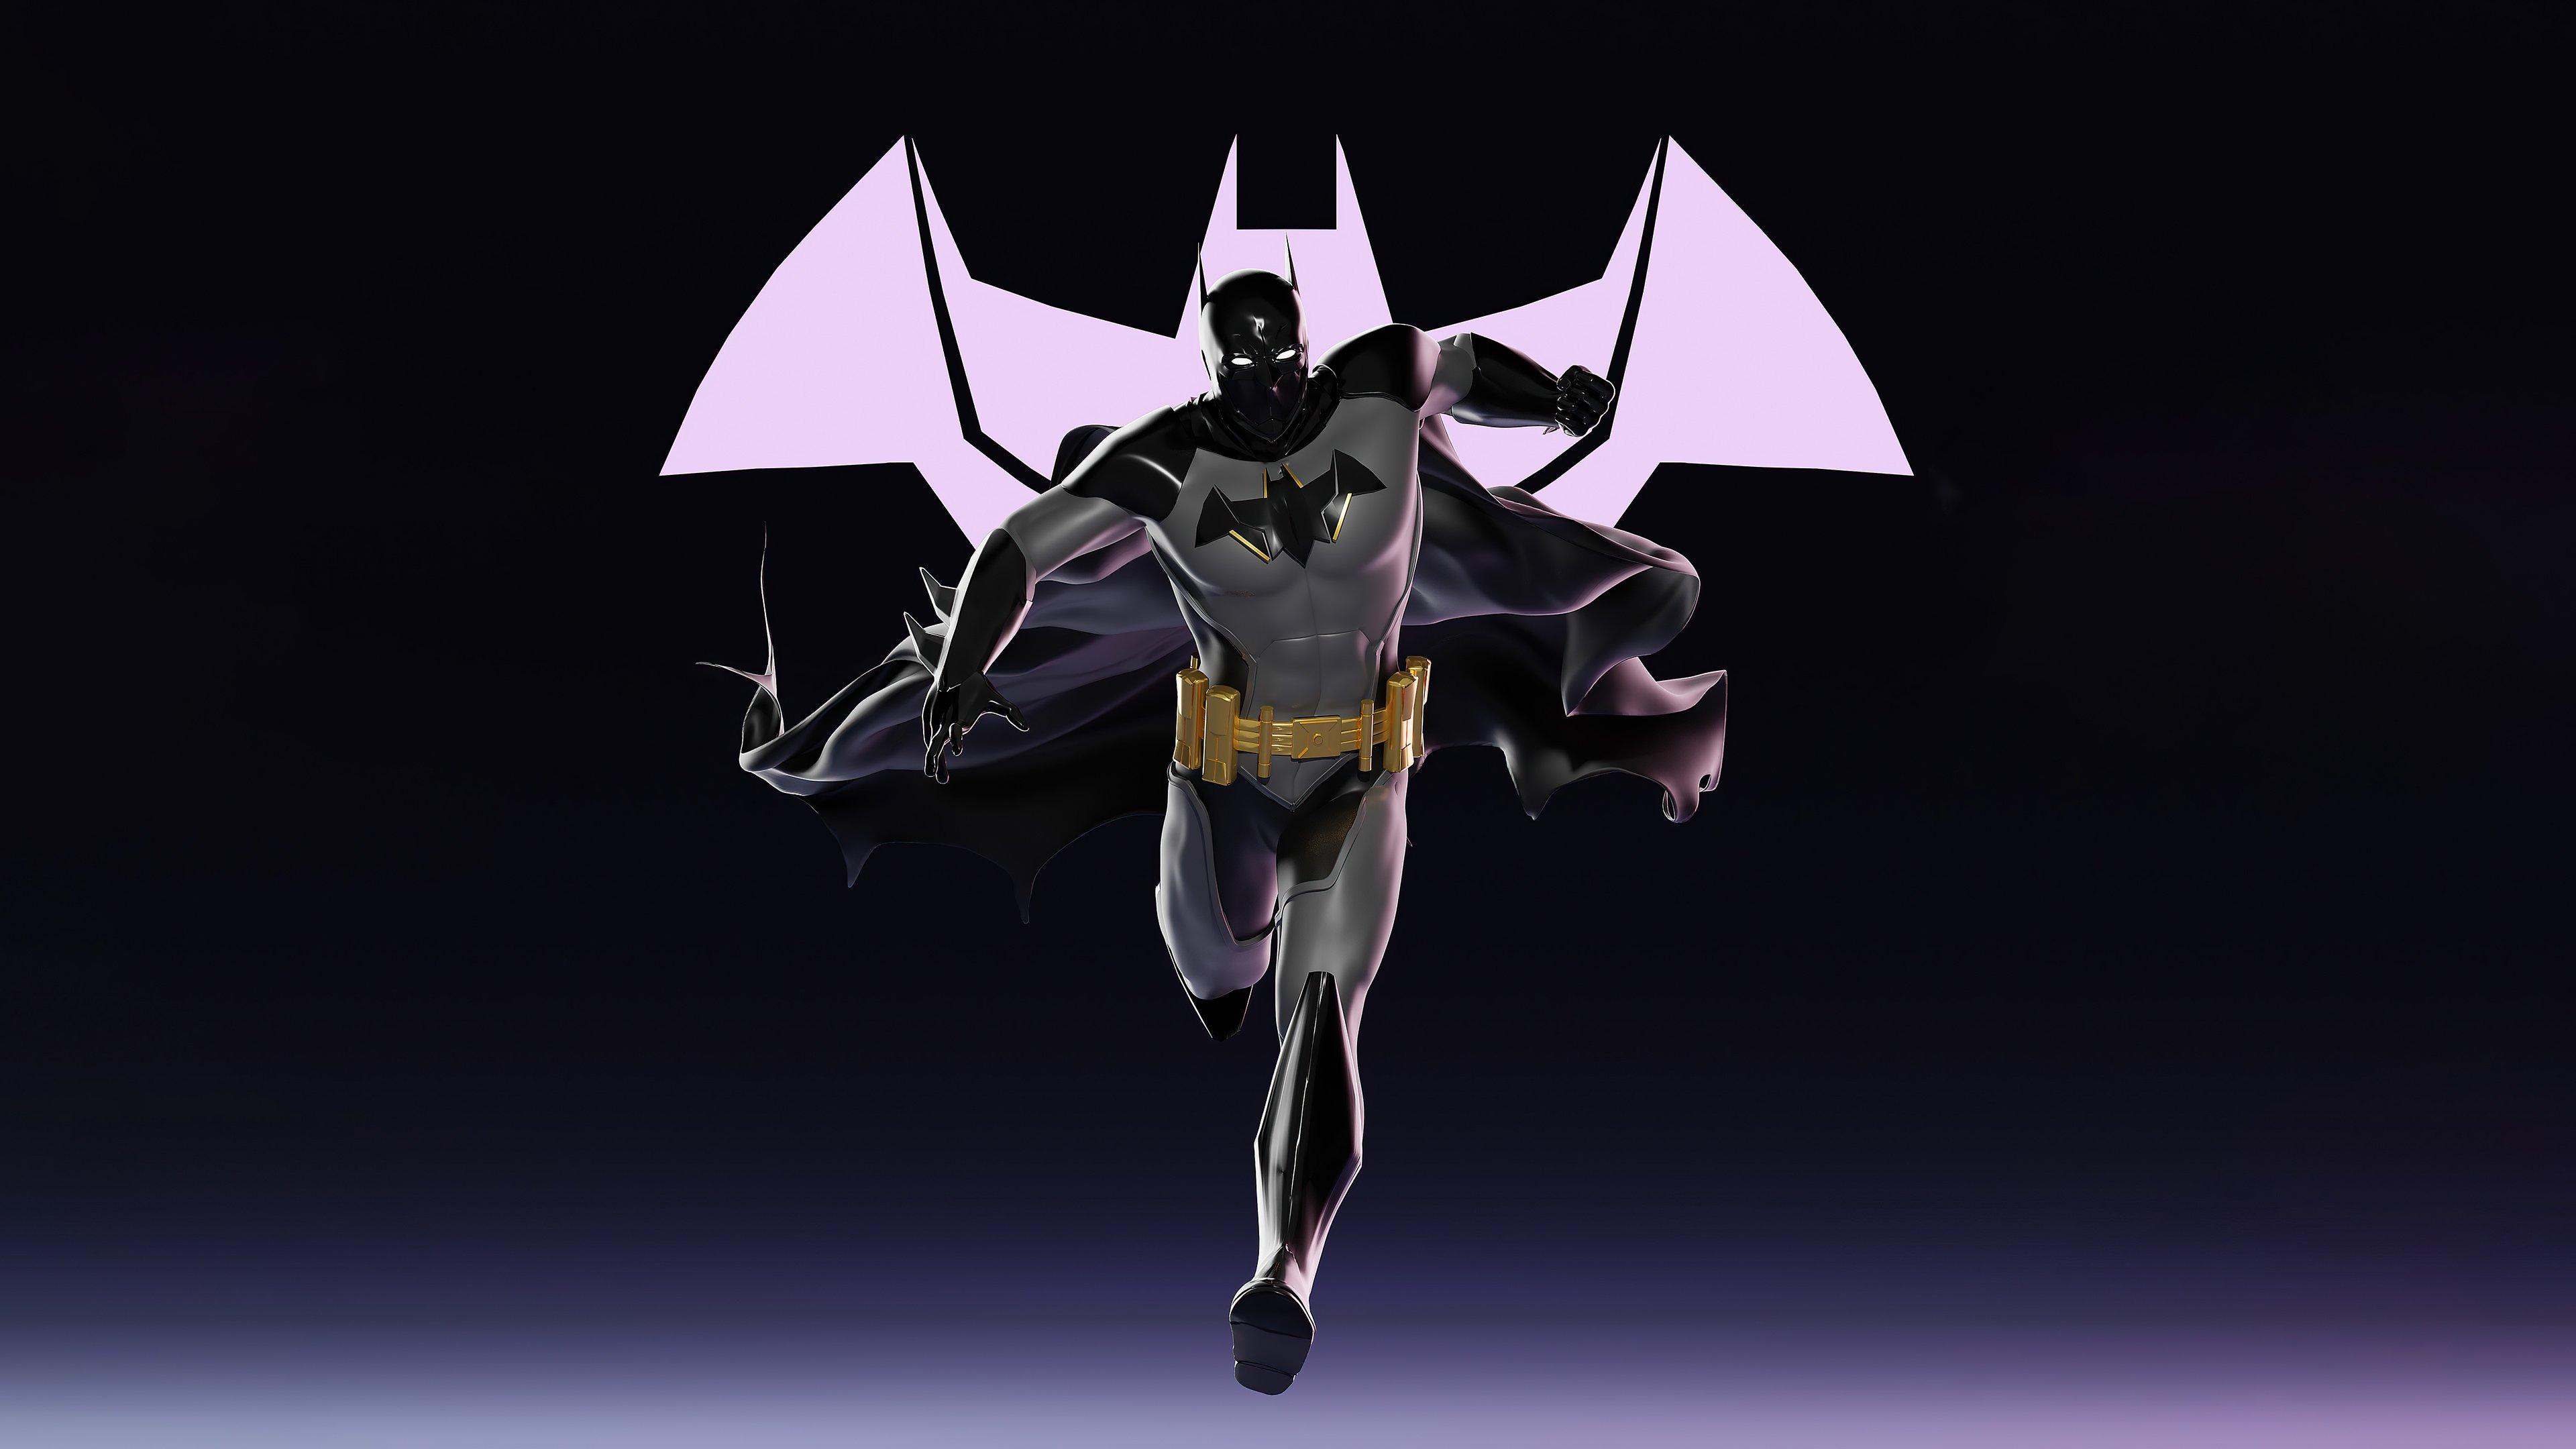 Wallpaper Batman running Digital Art